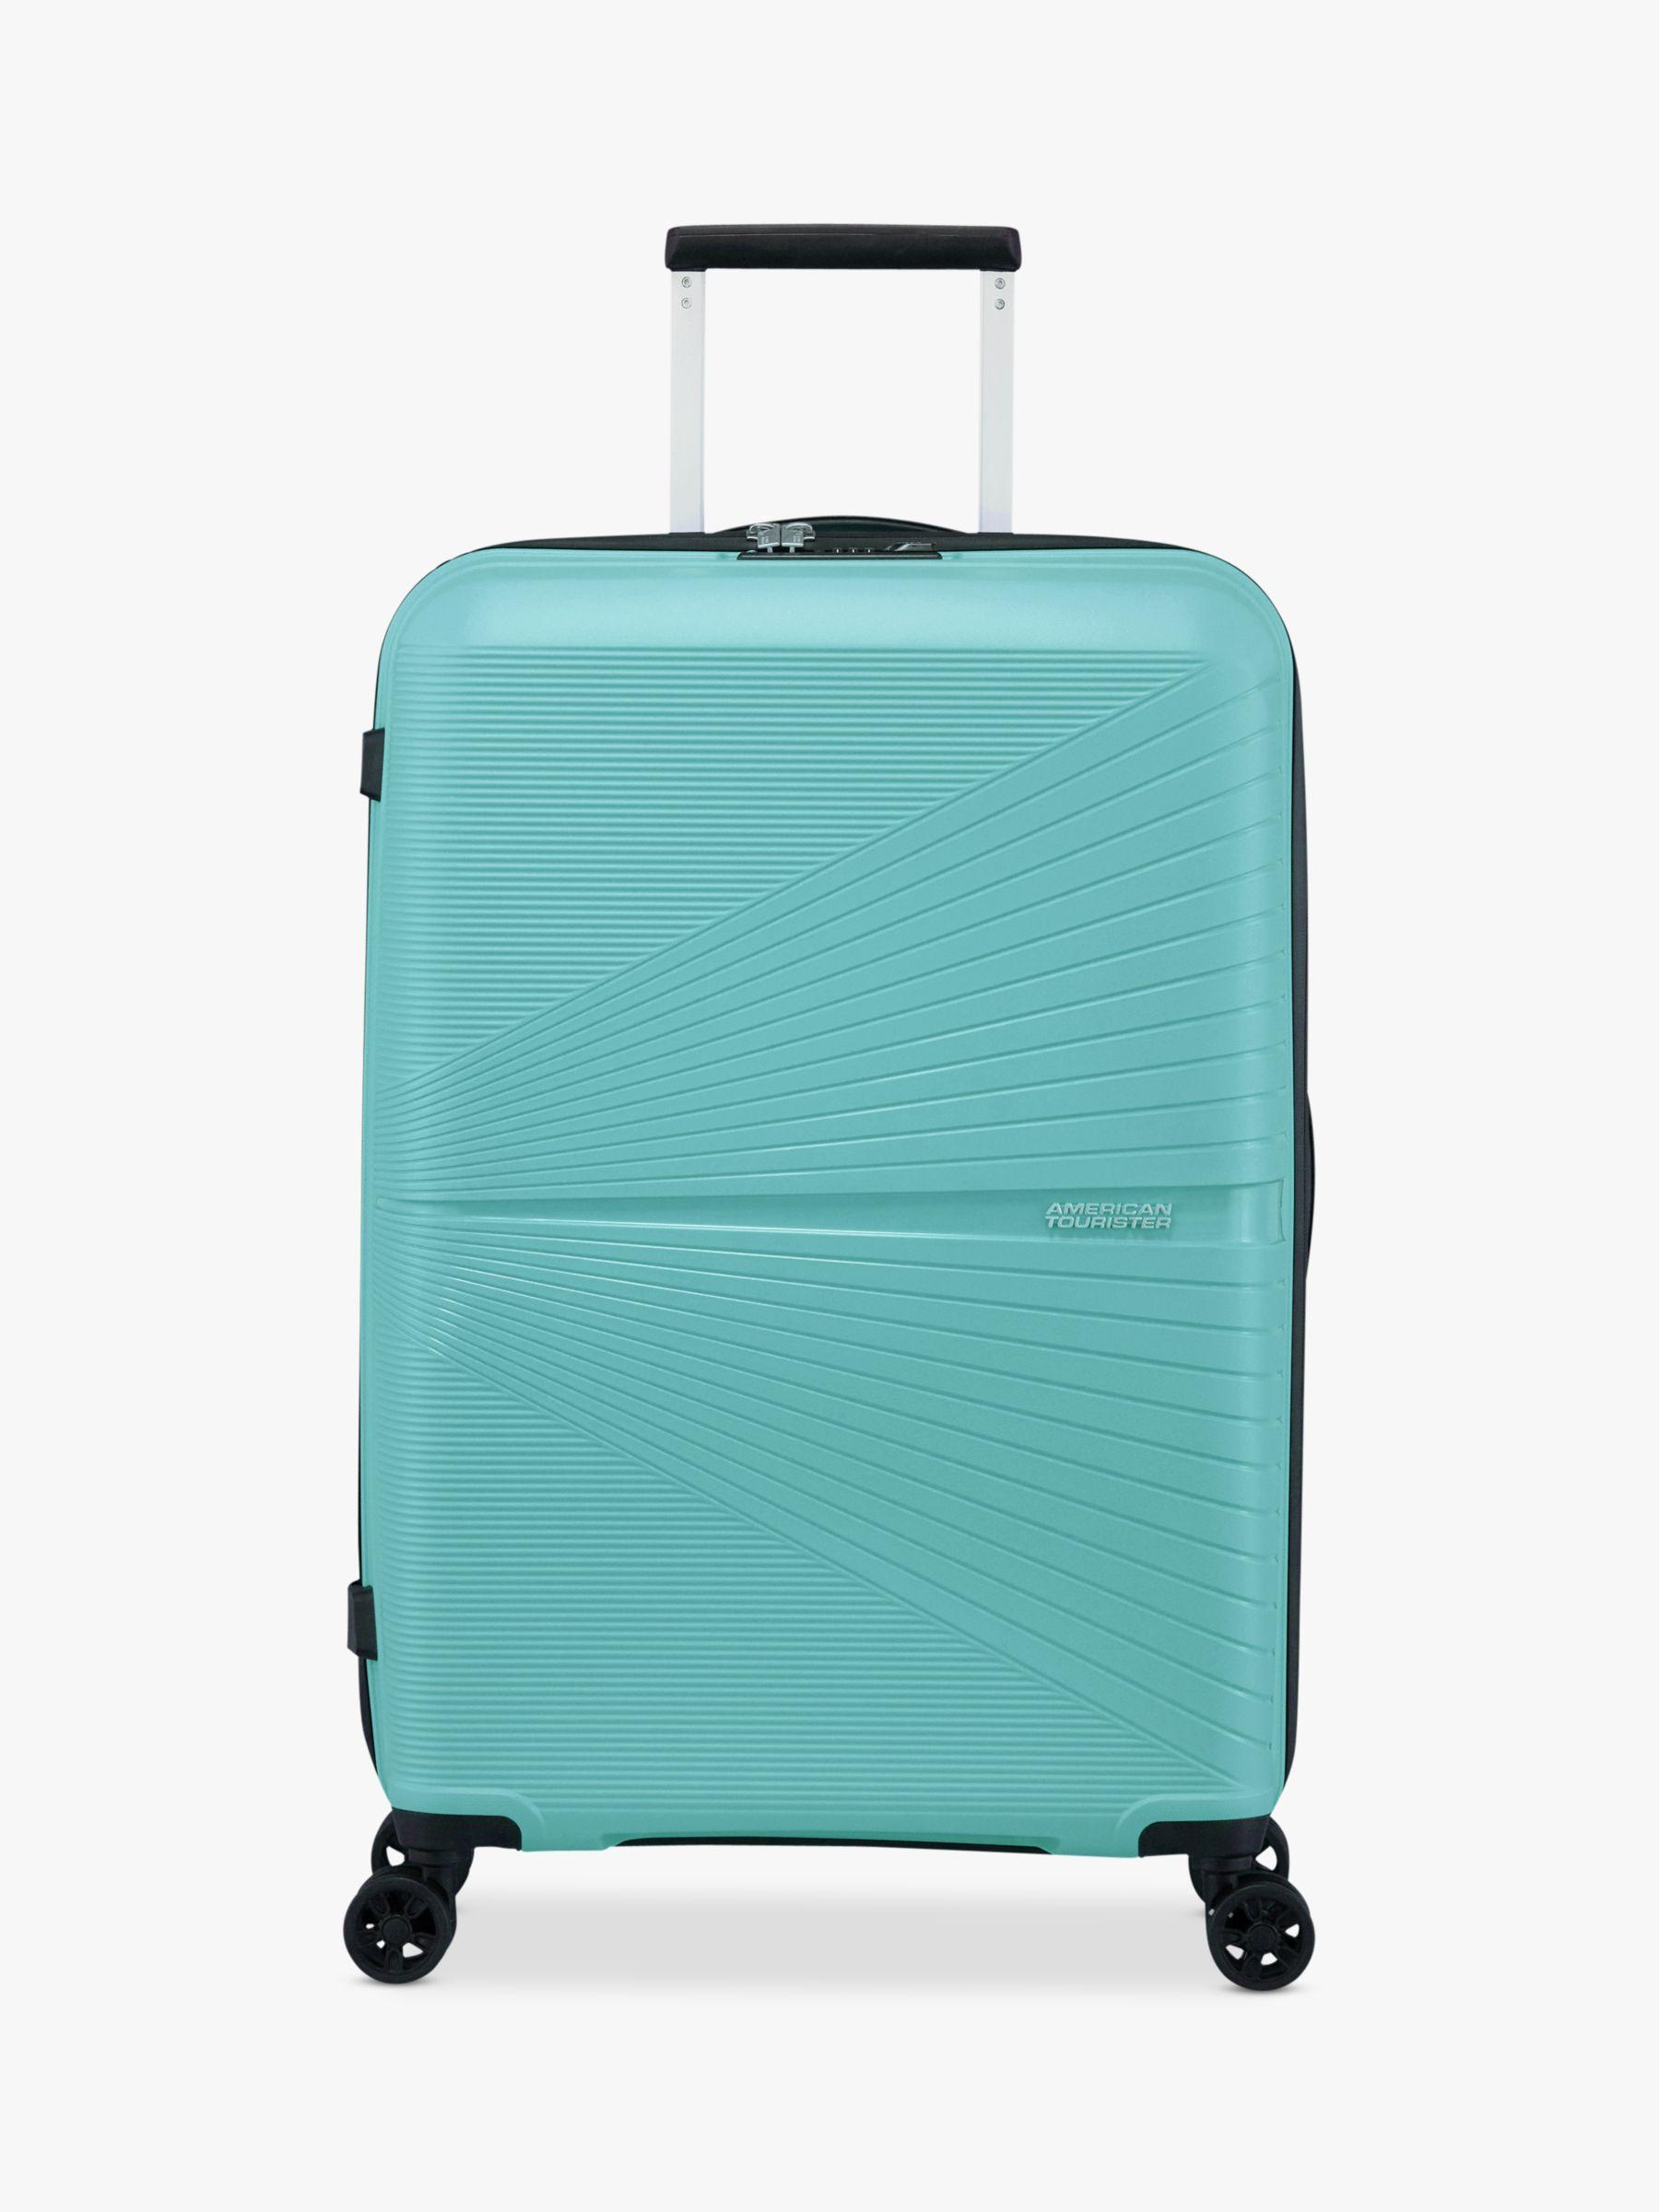 American Tourister American Tourister Airconic 67cm 4-Wheel Medium Suitcase